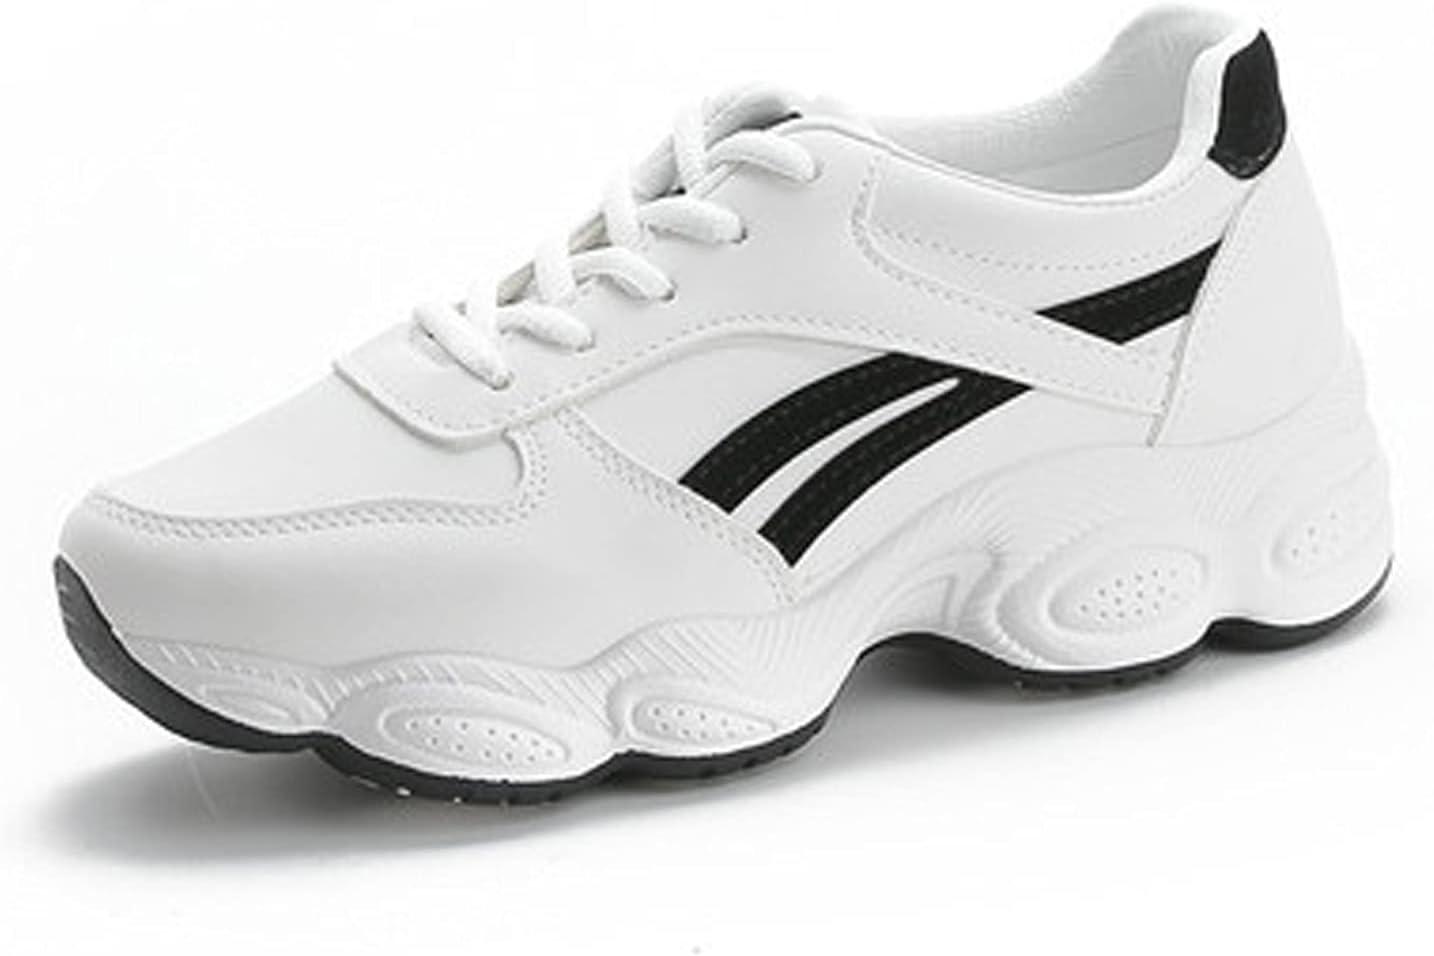 Womens Athletic Walking Shoes Lightweight Slip Virginia Sales Beach Mall Cushi Air on Mesh